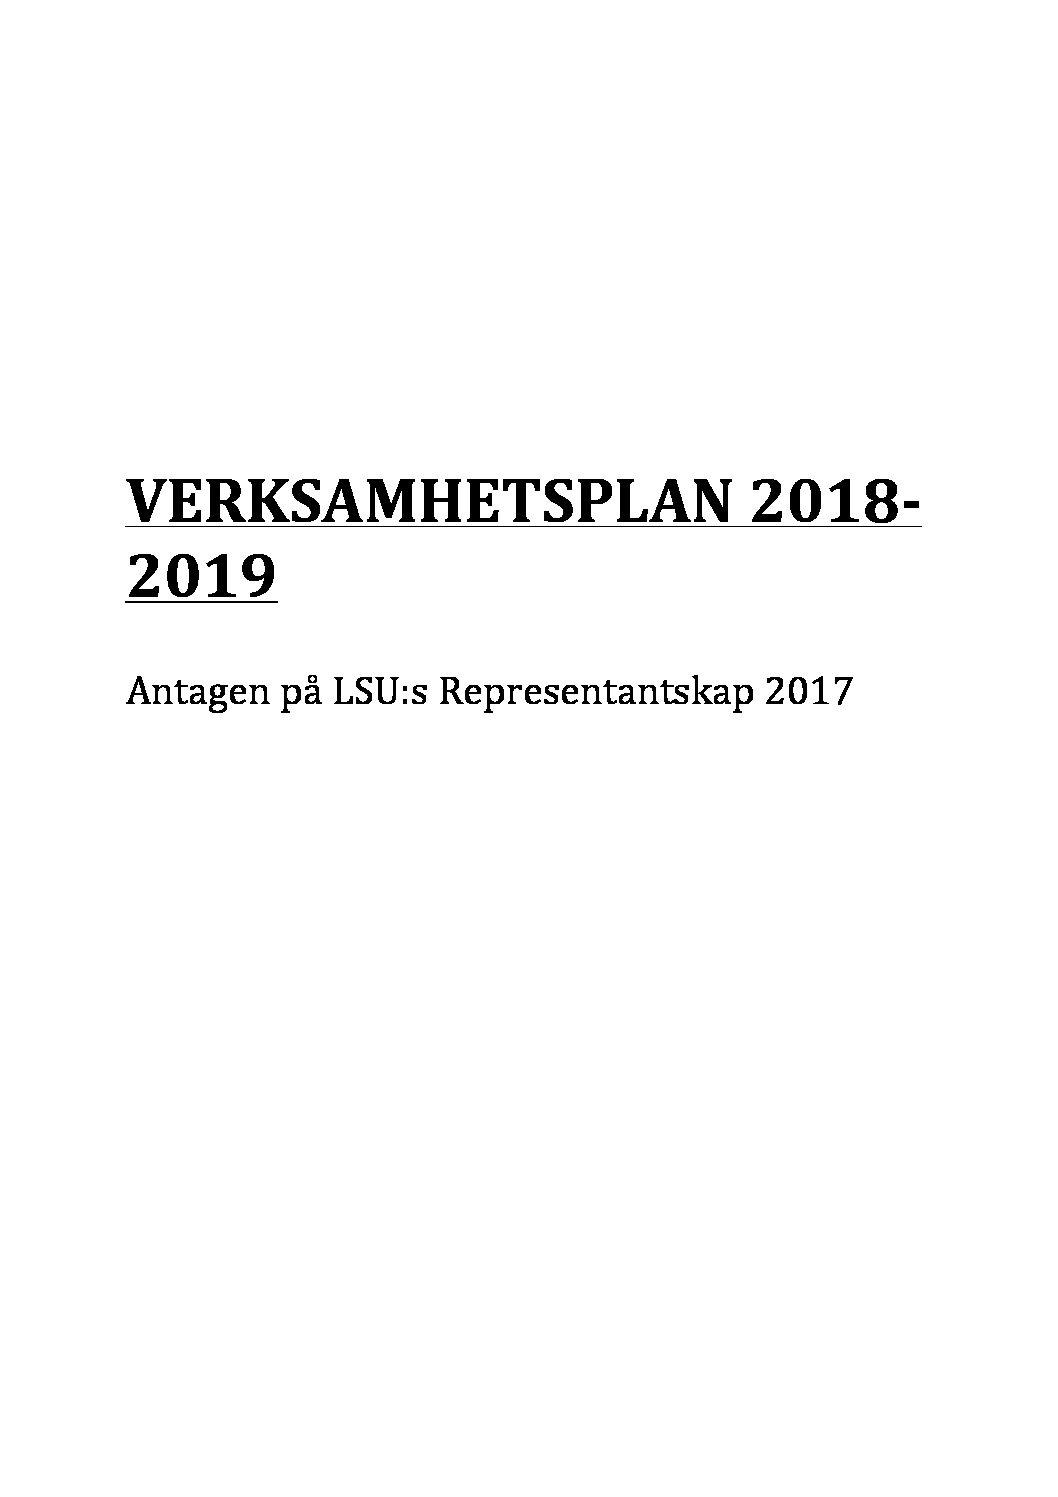 Verksamhetsplan 2018-2019